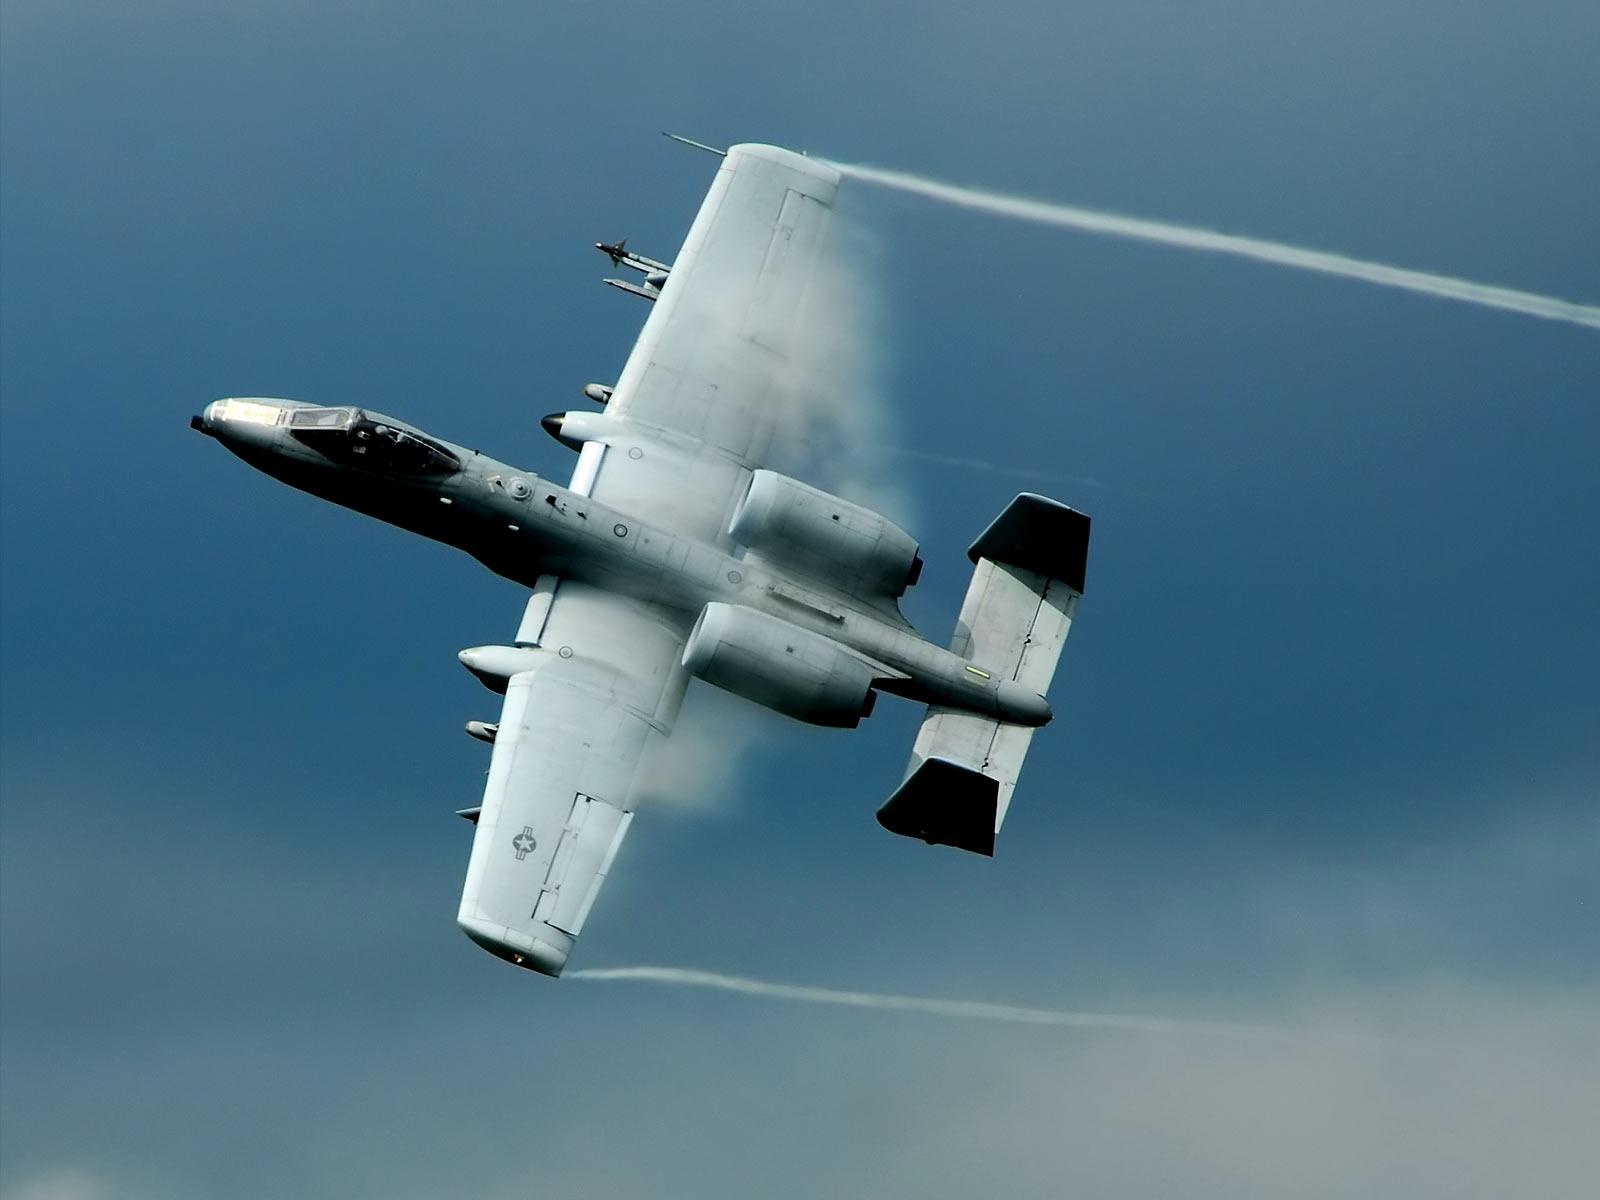 size 1600x1200 desktop wallpaper of a 10 military aircraft 1600x1200